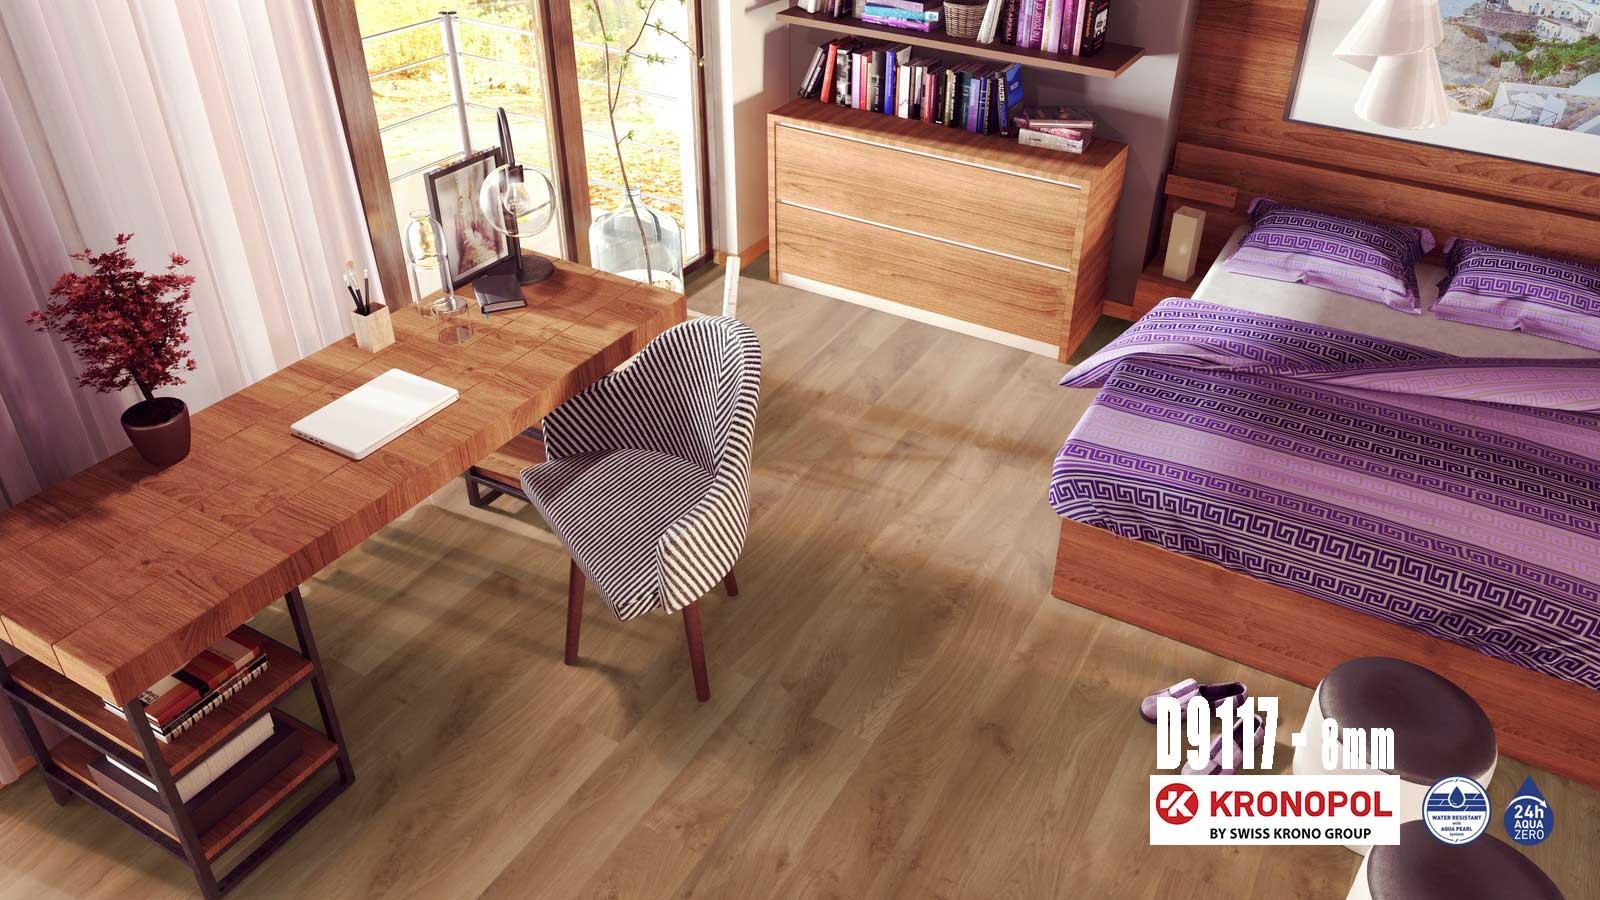 sàn gỗ kronopol ba lan